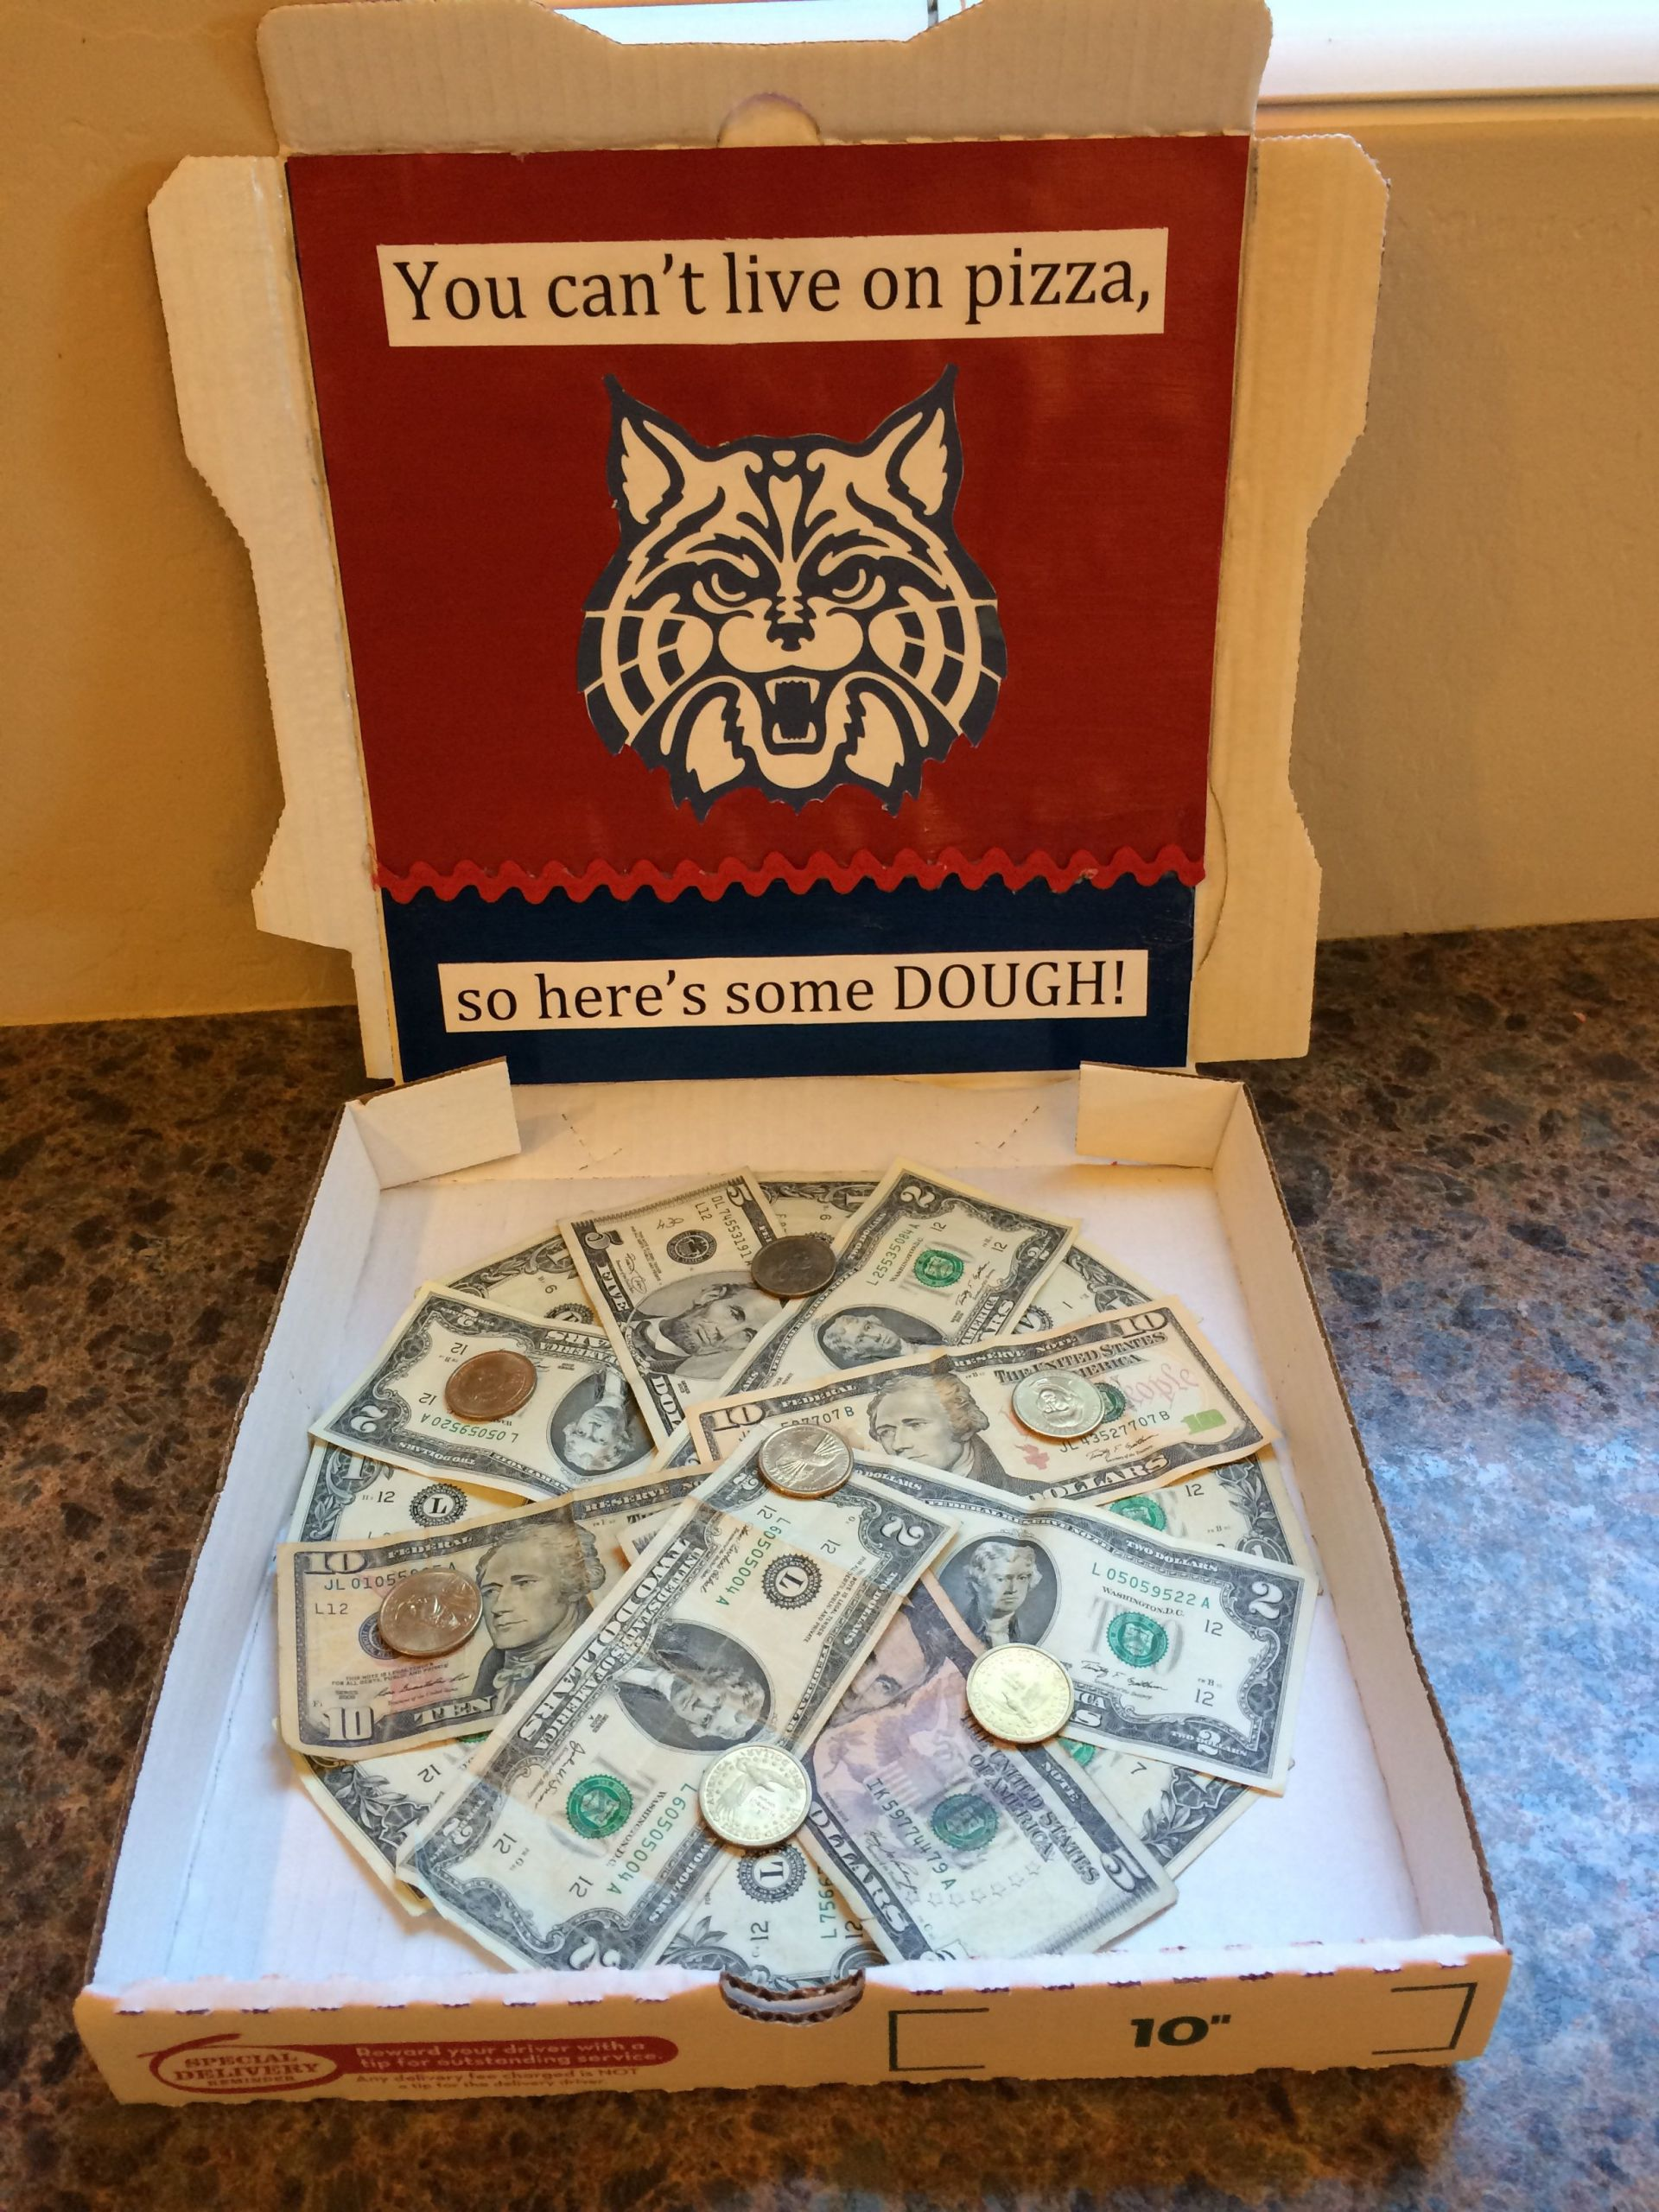 Diy Graduation Gift Ideas For Him  Top 25 8th Grade Graduation Gift Ideas for Him Home DIY